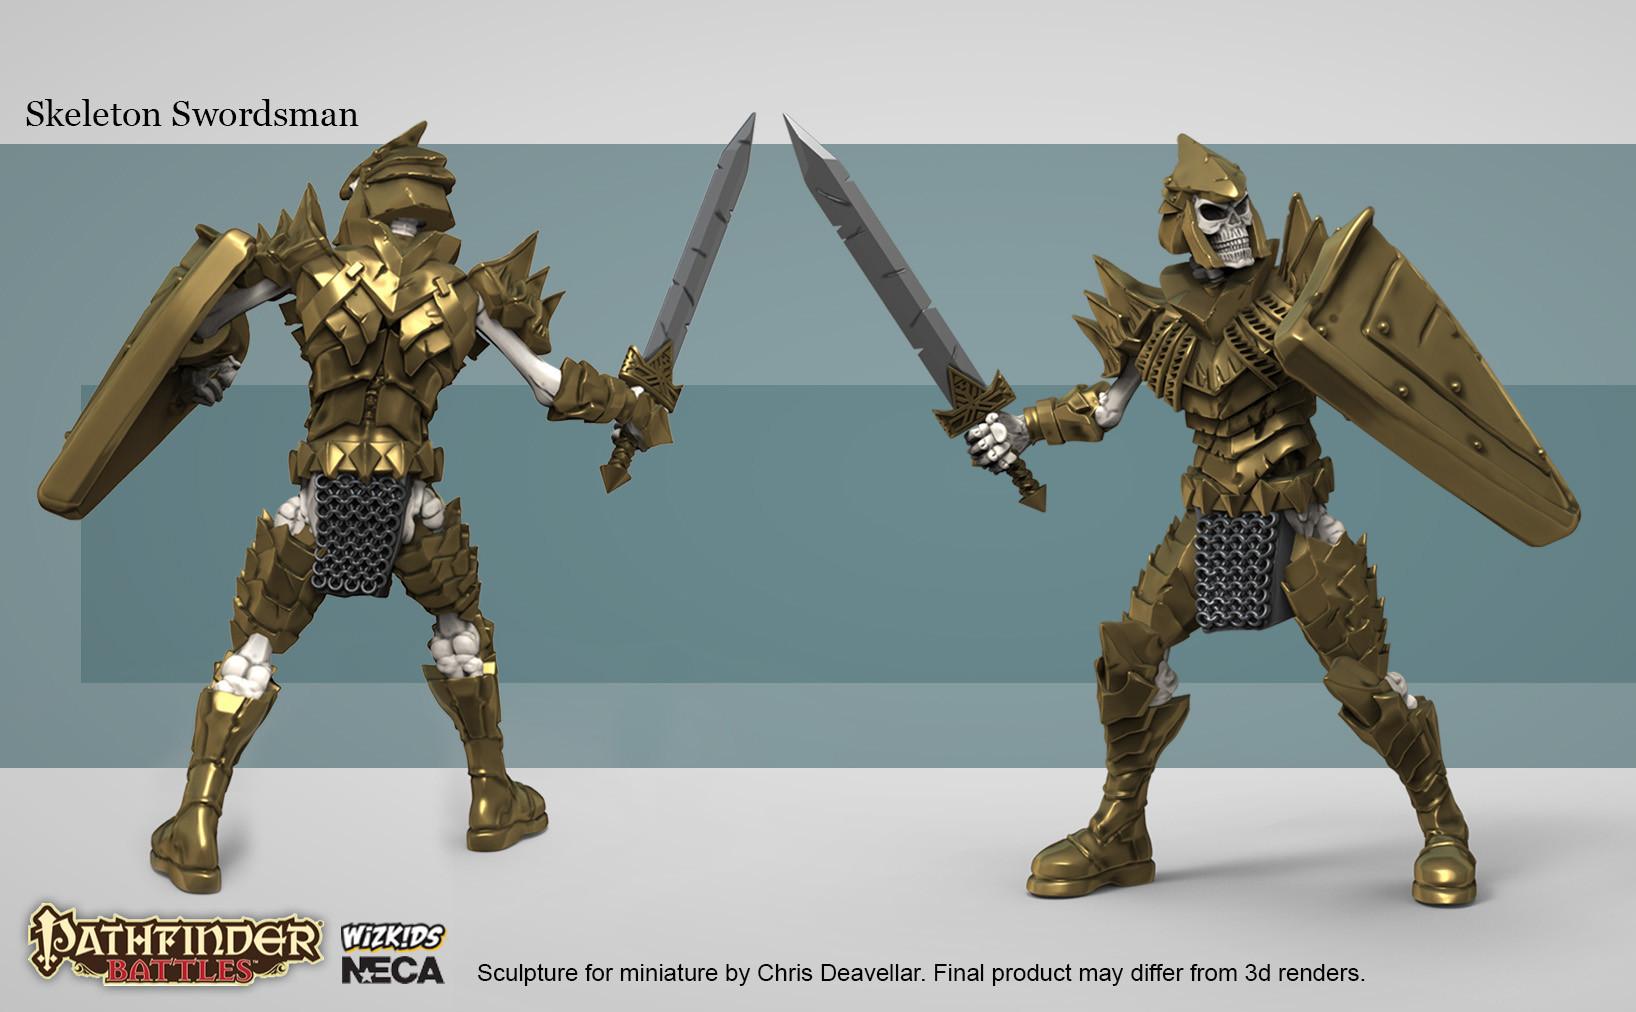 Chris deavellar neca pf skel sword website